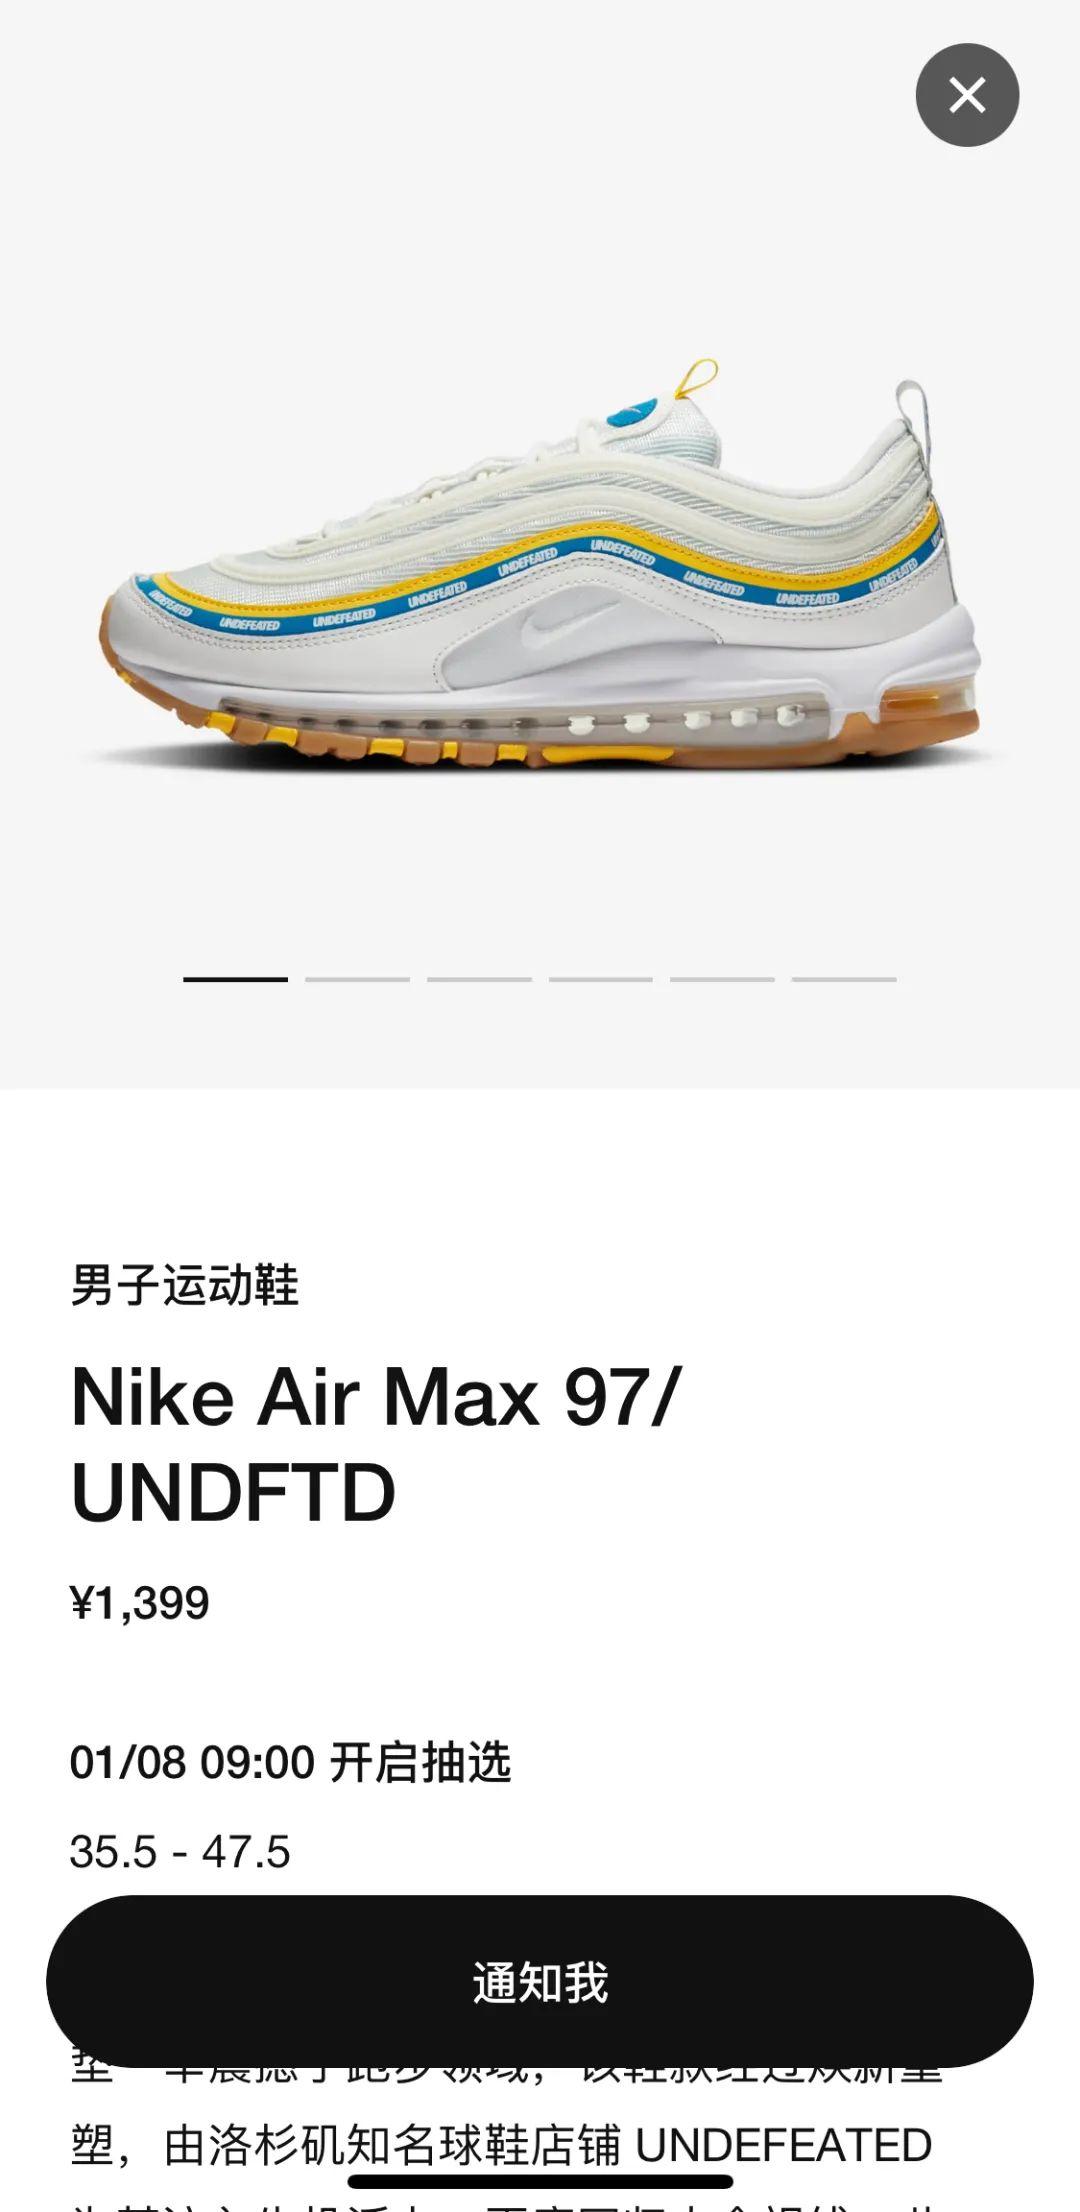 中国Snkrs上架!UND x 耐克Air Max白子弹明日发售链接!